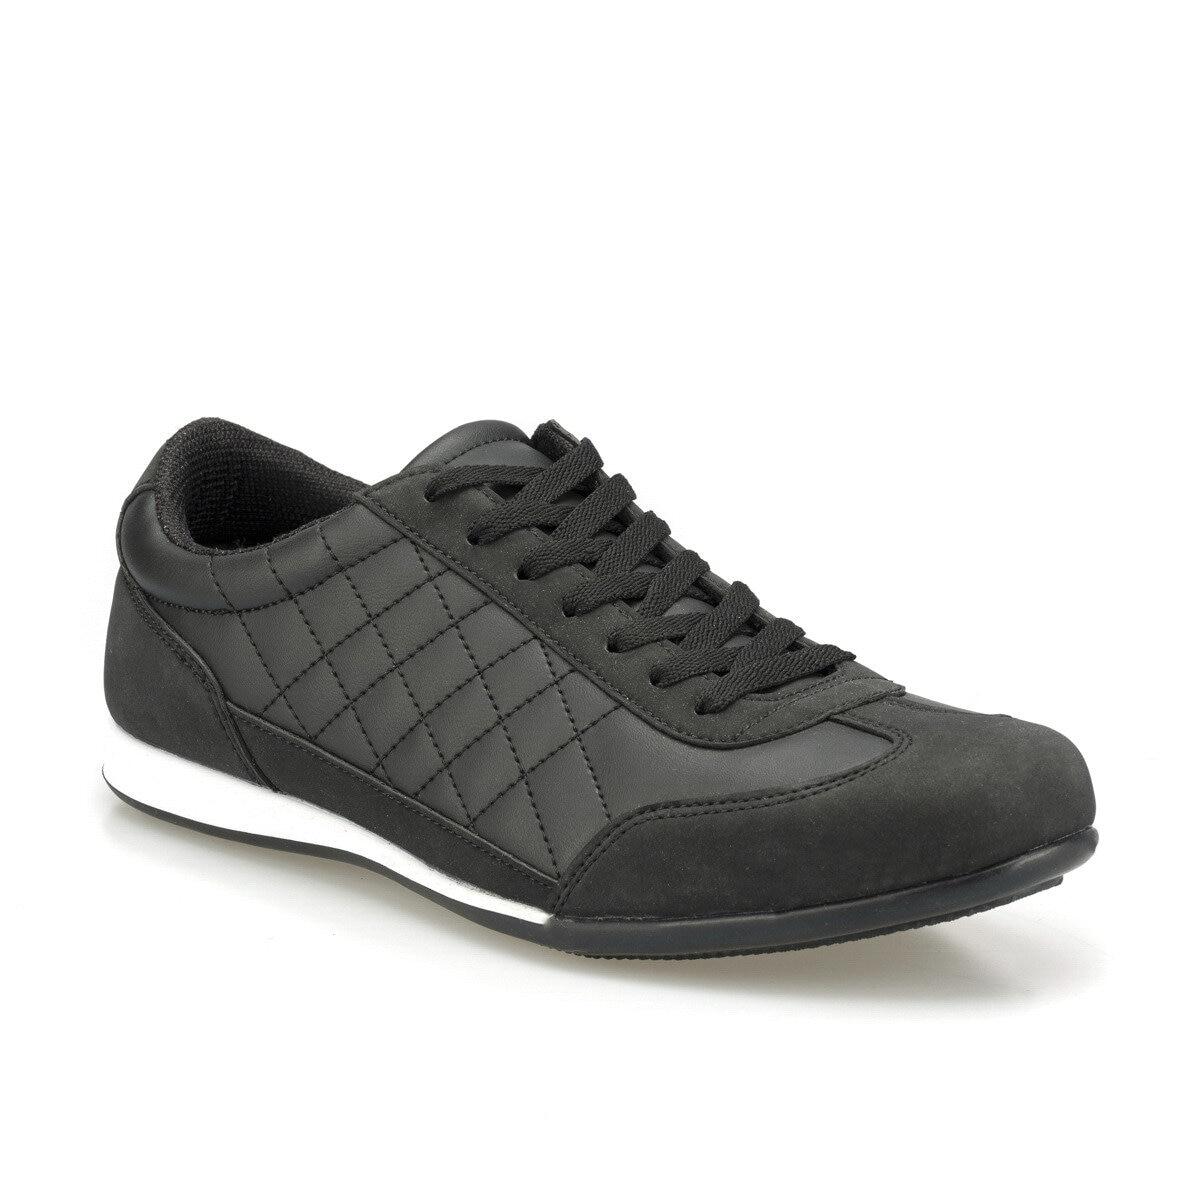 FLO 356510.M Black Men 'S Sneaker Shoes Polaris